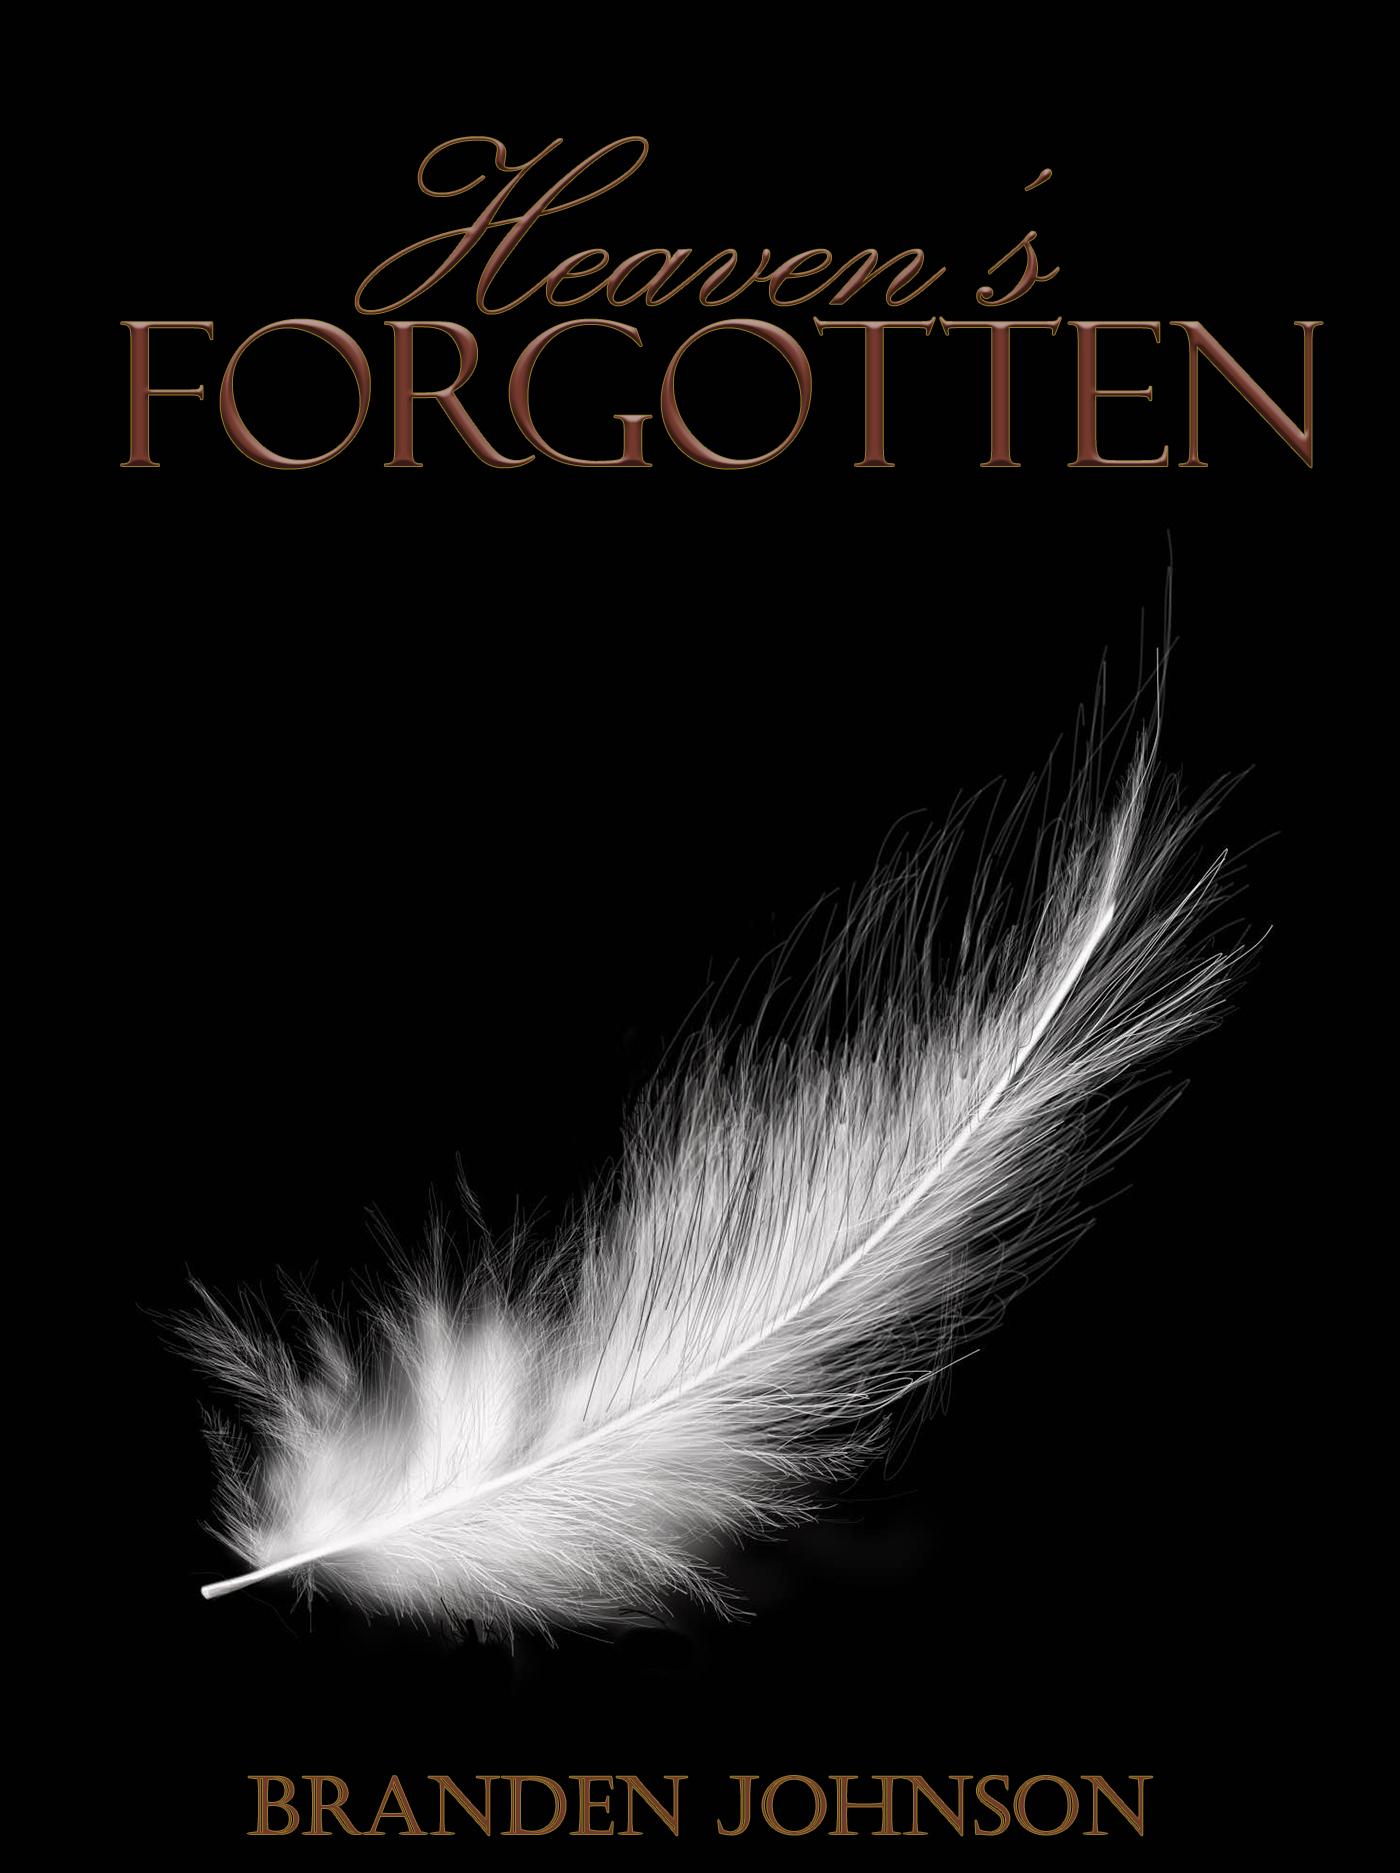 Heavens Forgotten  by  Branden Johnson